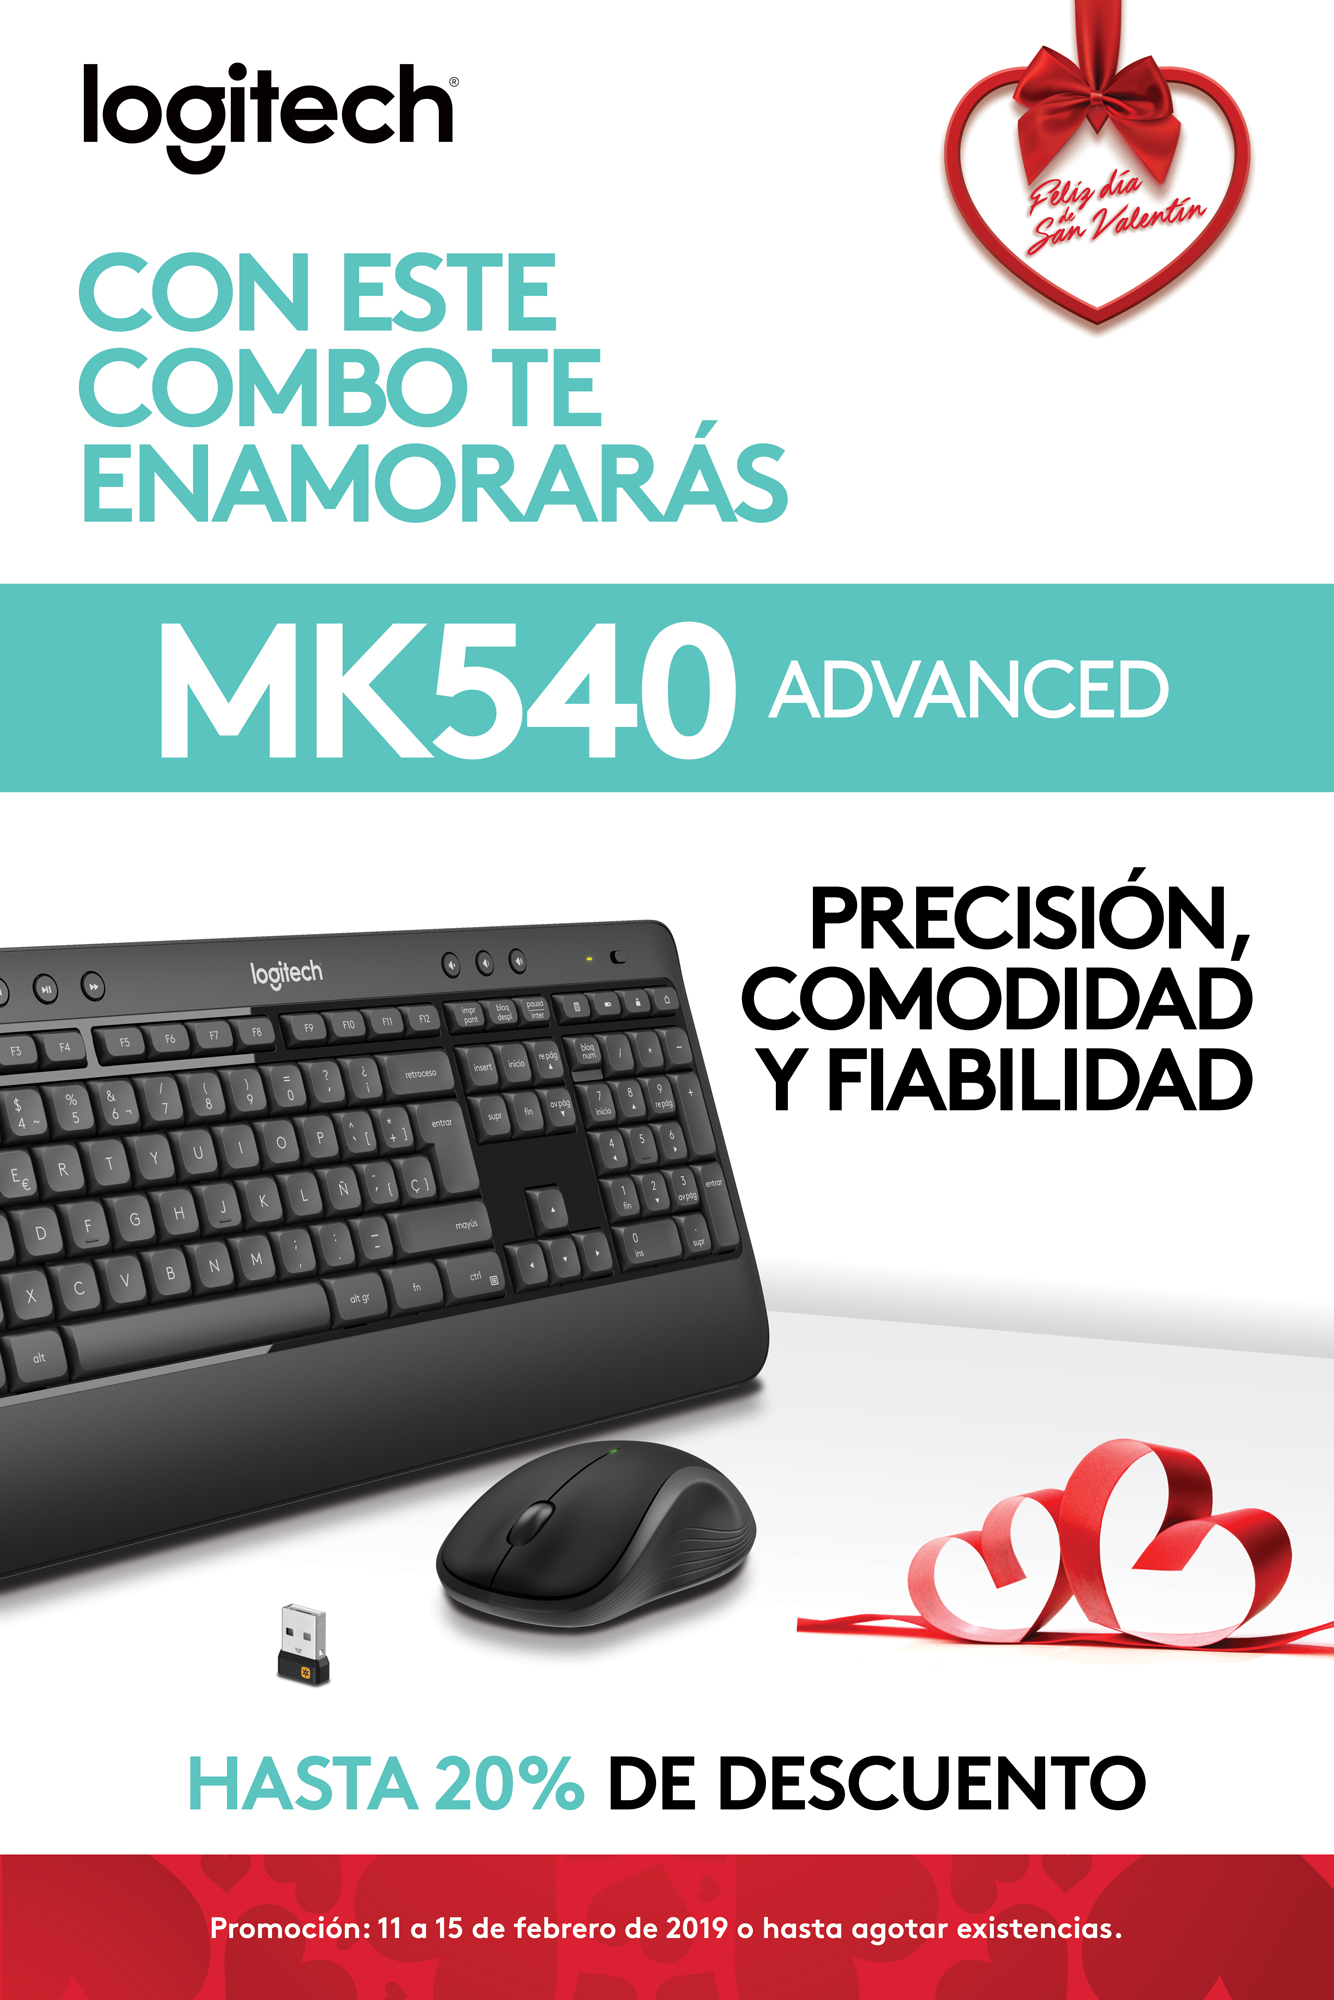 Promo MK540 - Combo teclado y Mouse - Logitech